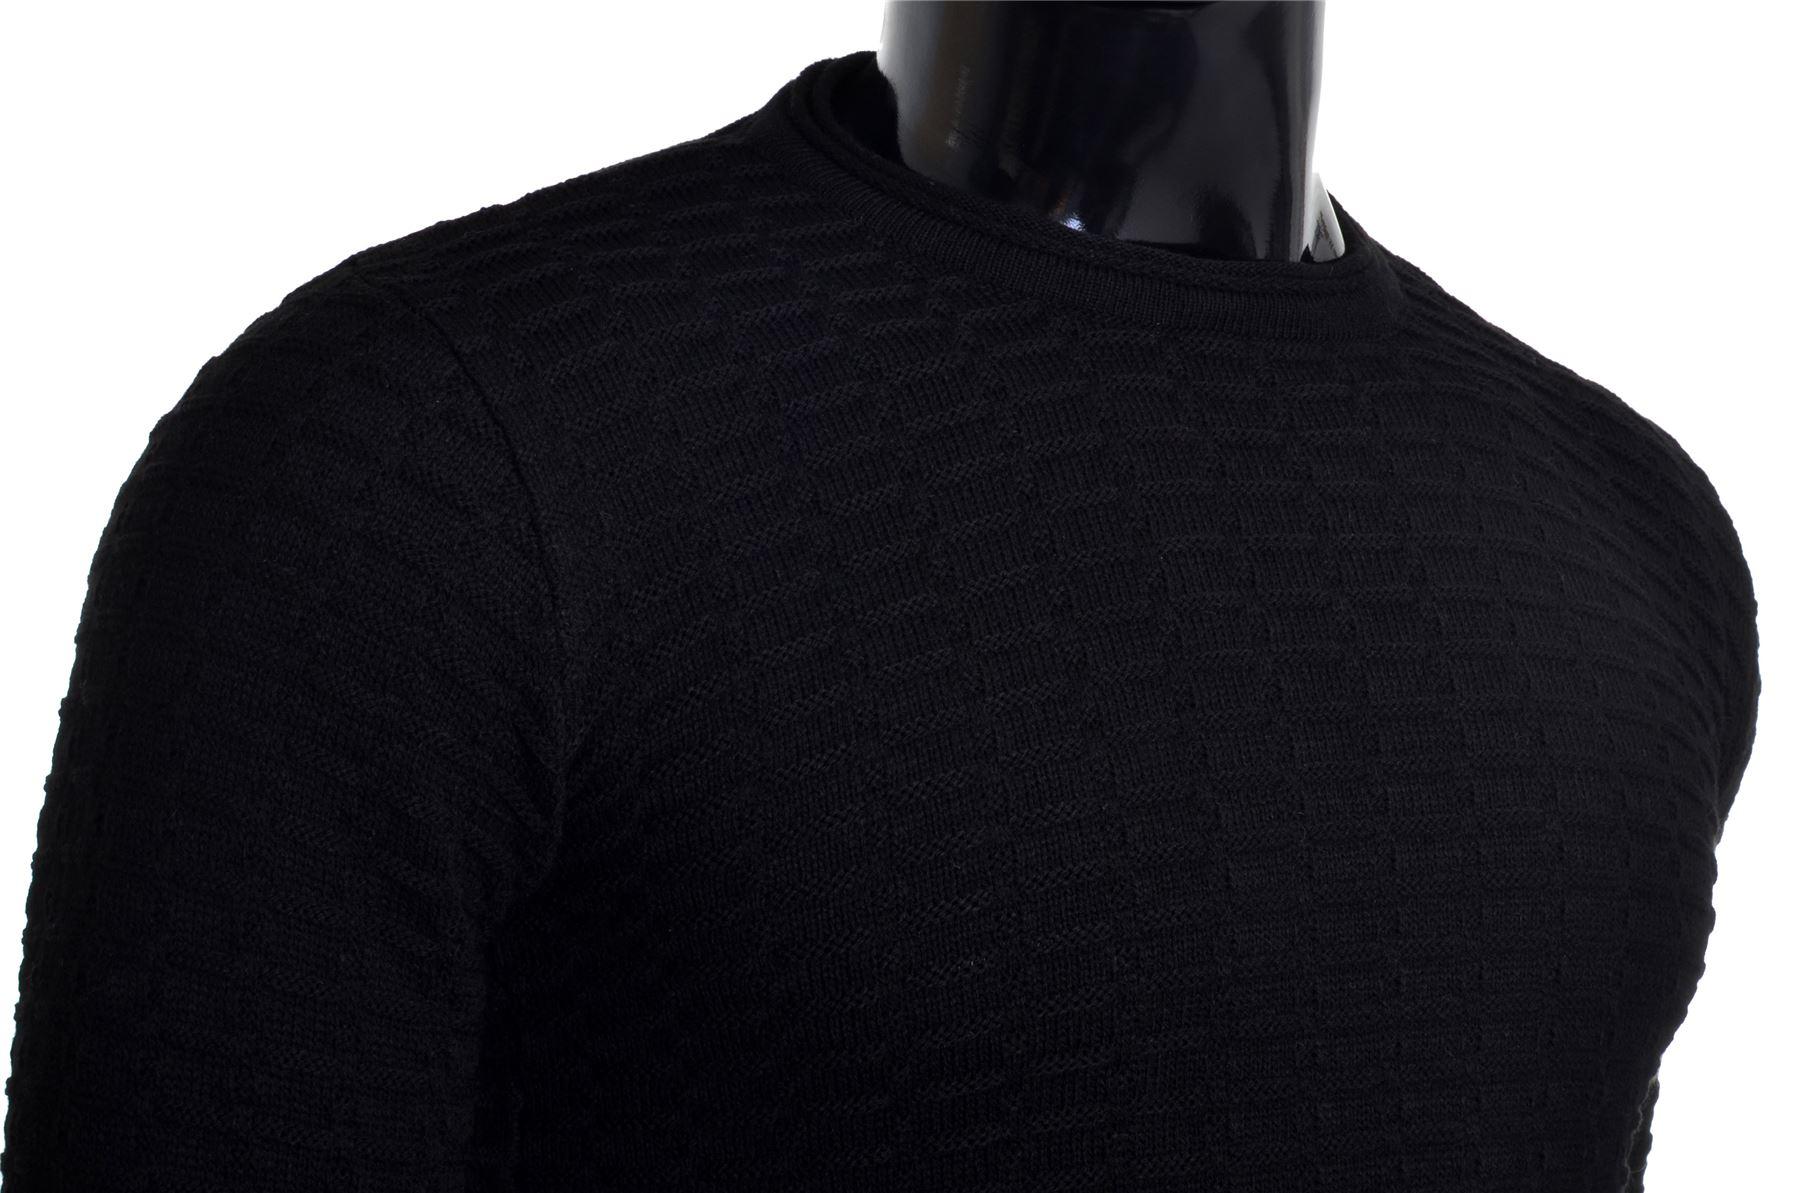 Men-039-s-Jumper-Striped-Knit-Smart-Long-Sleeve-Sweater-Crew-Neck-Top-Slim-Fitness thumbnail 10